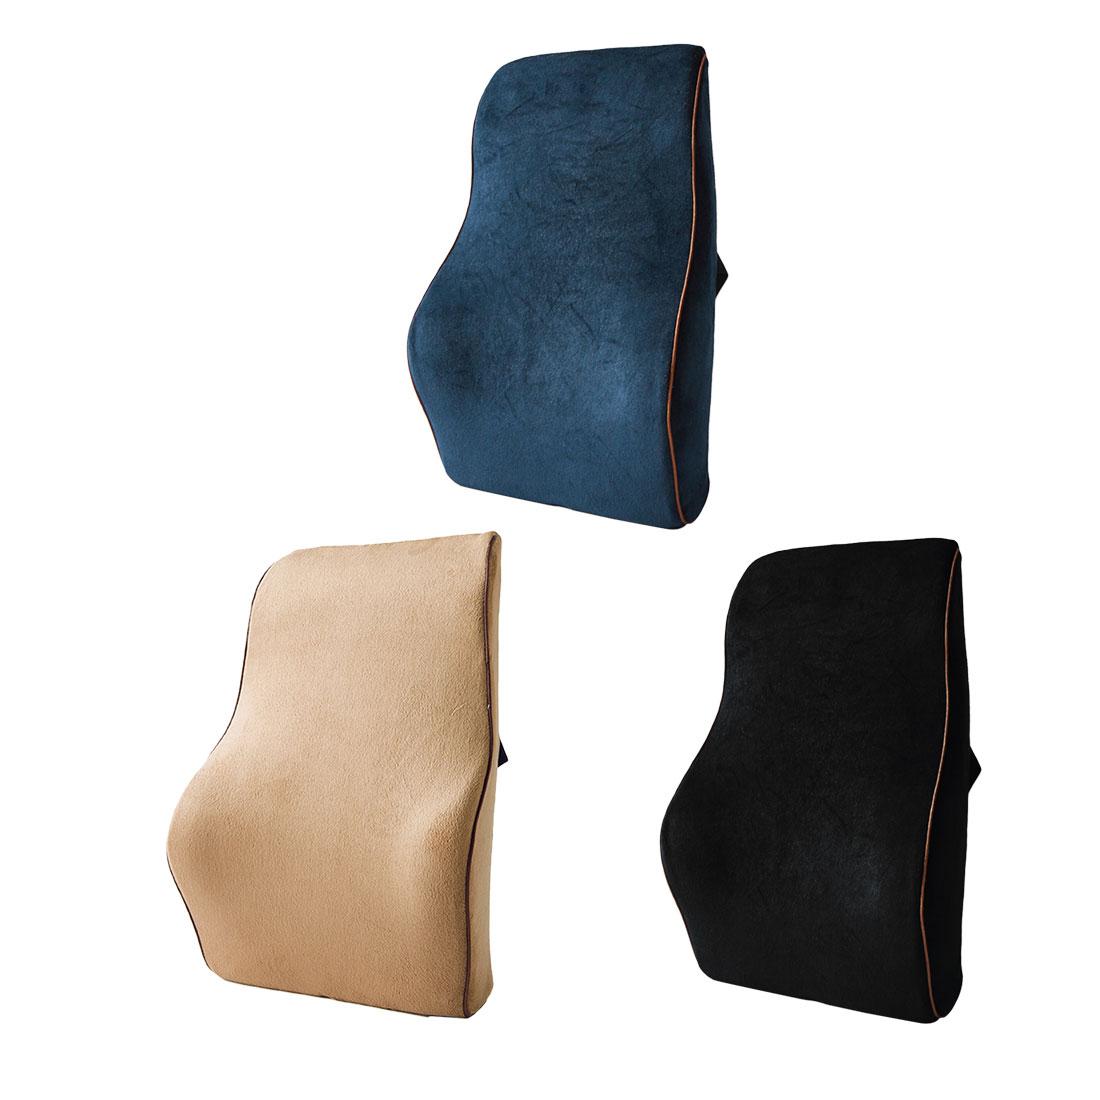 Dewtreetali Car Memory Foam Lumbar Back Support Pillow